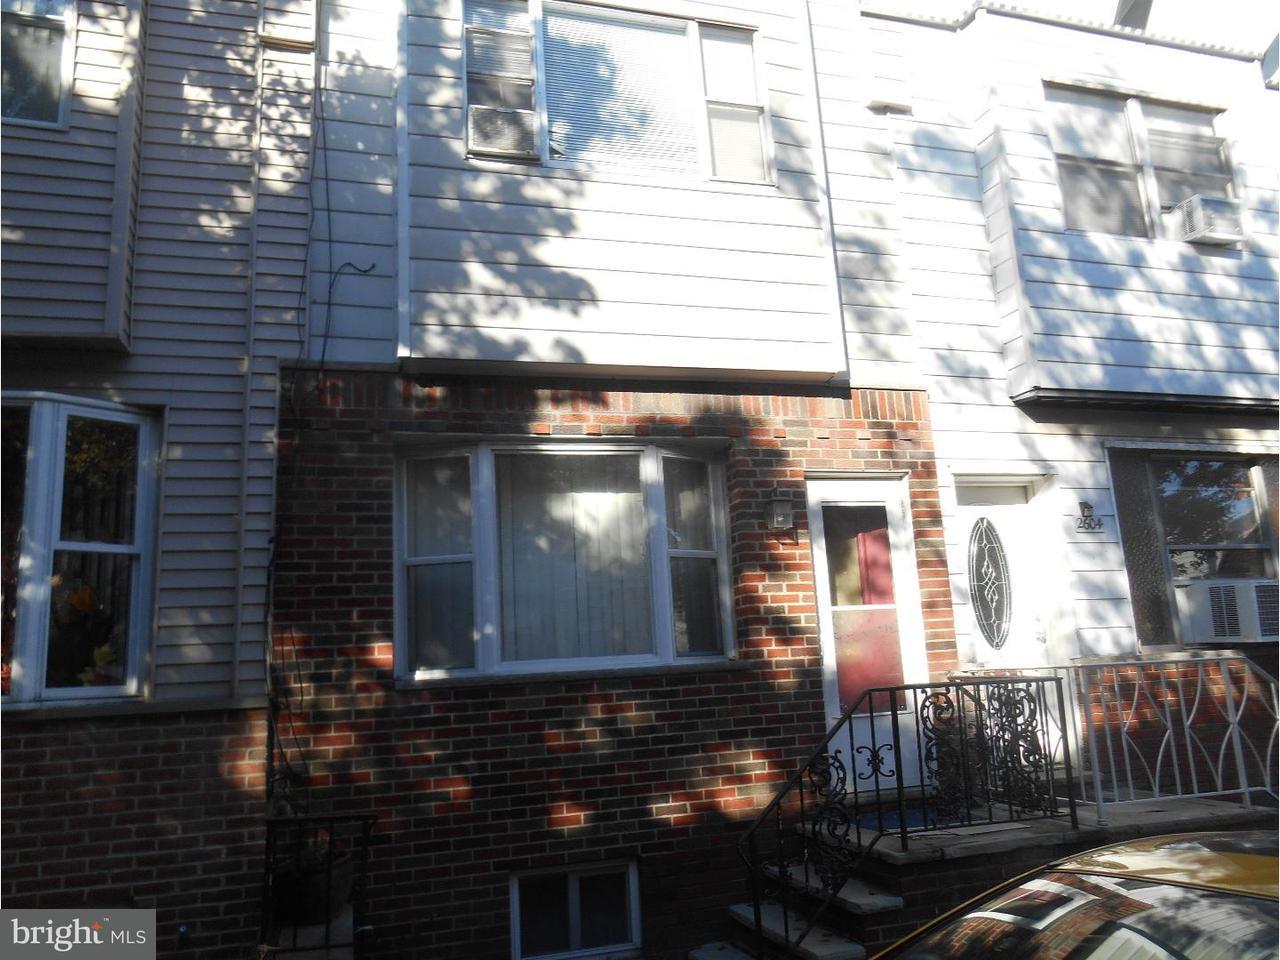 Casa unifamiliar adosada (Townhouse) por un Venta en 2606 S HUTCHINSON Street Philadelphia, Pennsylvania 19148 Estados Unidos